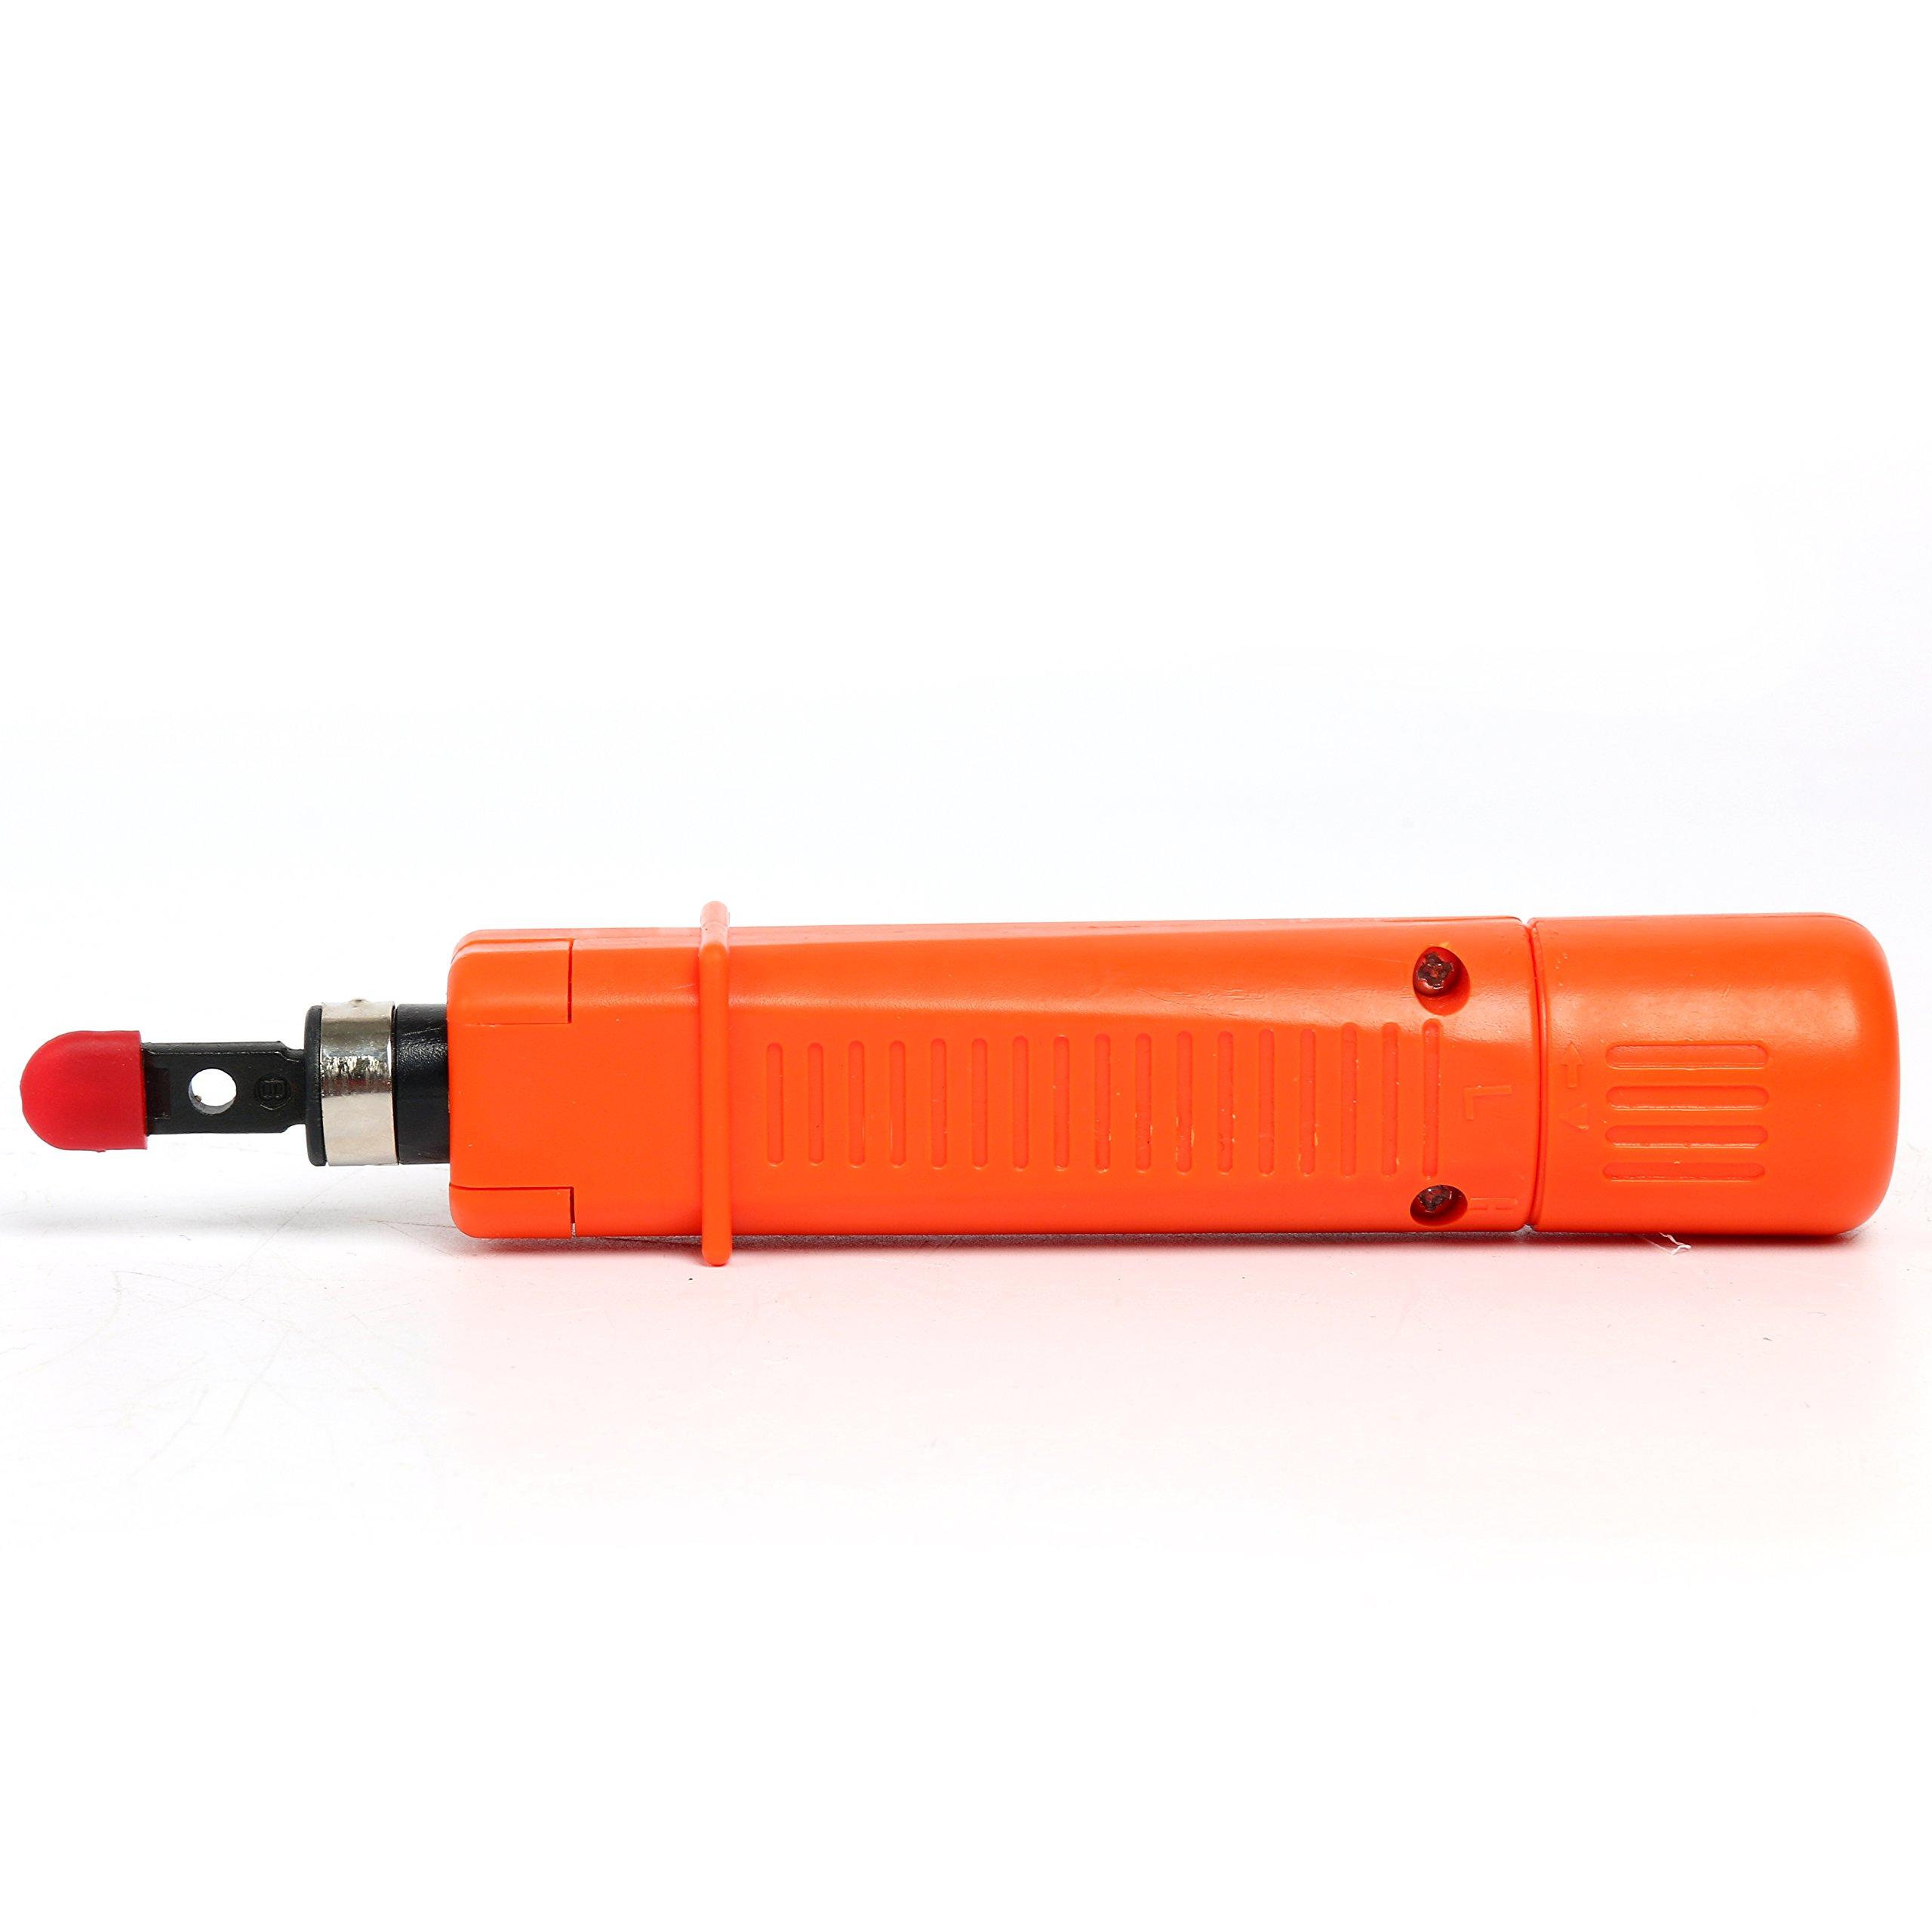 Yaetek Portable Ethernet Network Tool Cable Tester LAN Kit RJ45 Crimper Plug Crimping tool Set Punch Down RJ11 Cat5 Cat6 Wire Line Detector by YaeTek (Image #6)